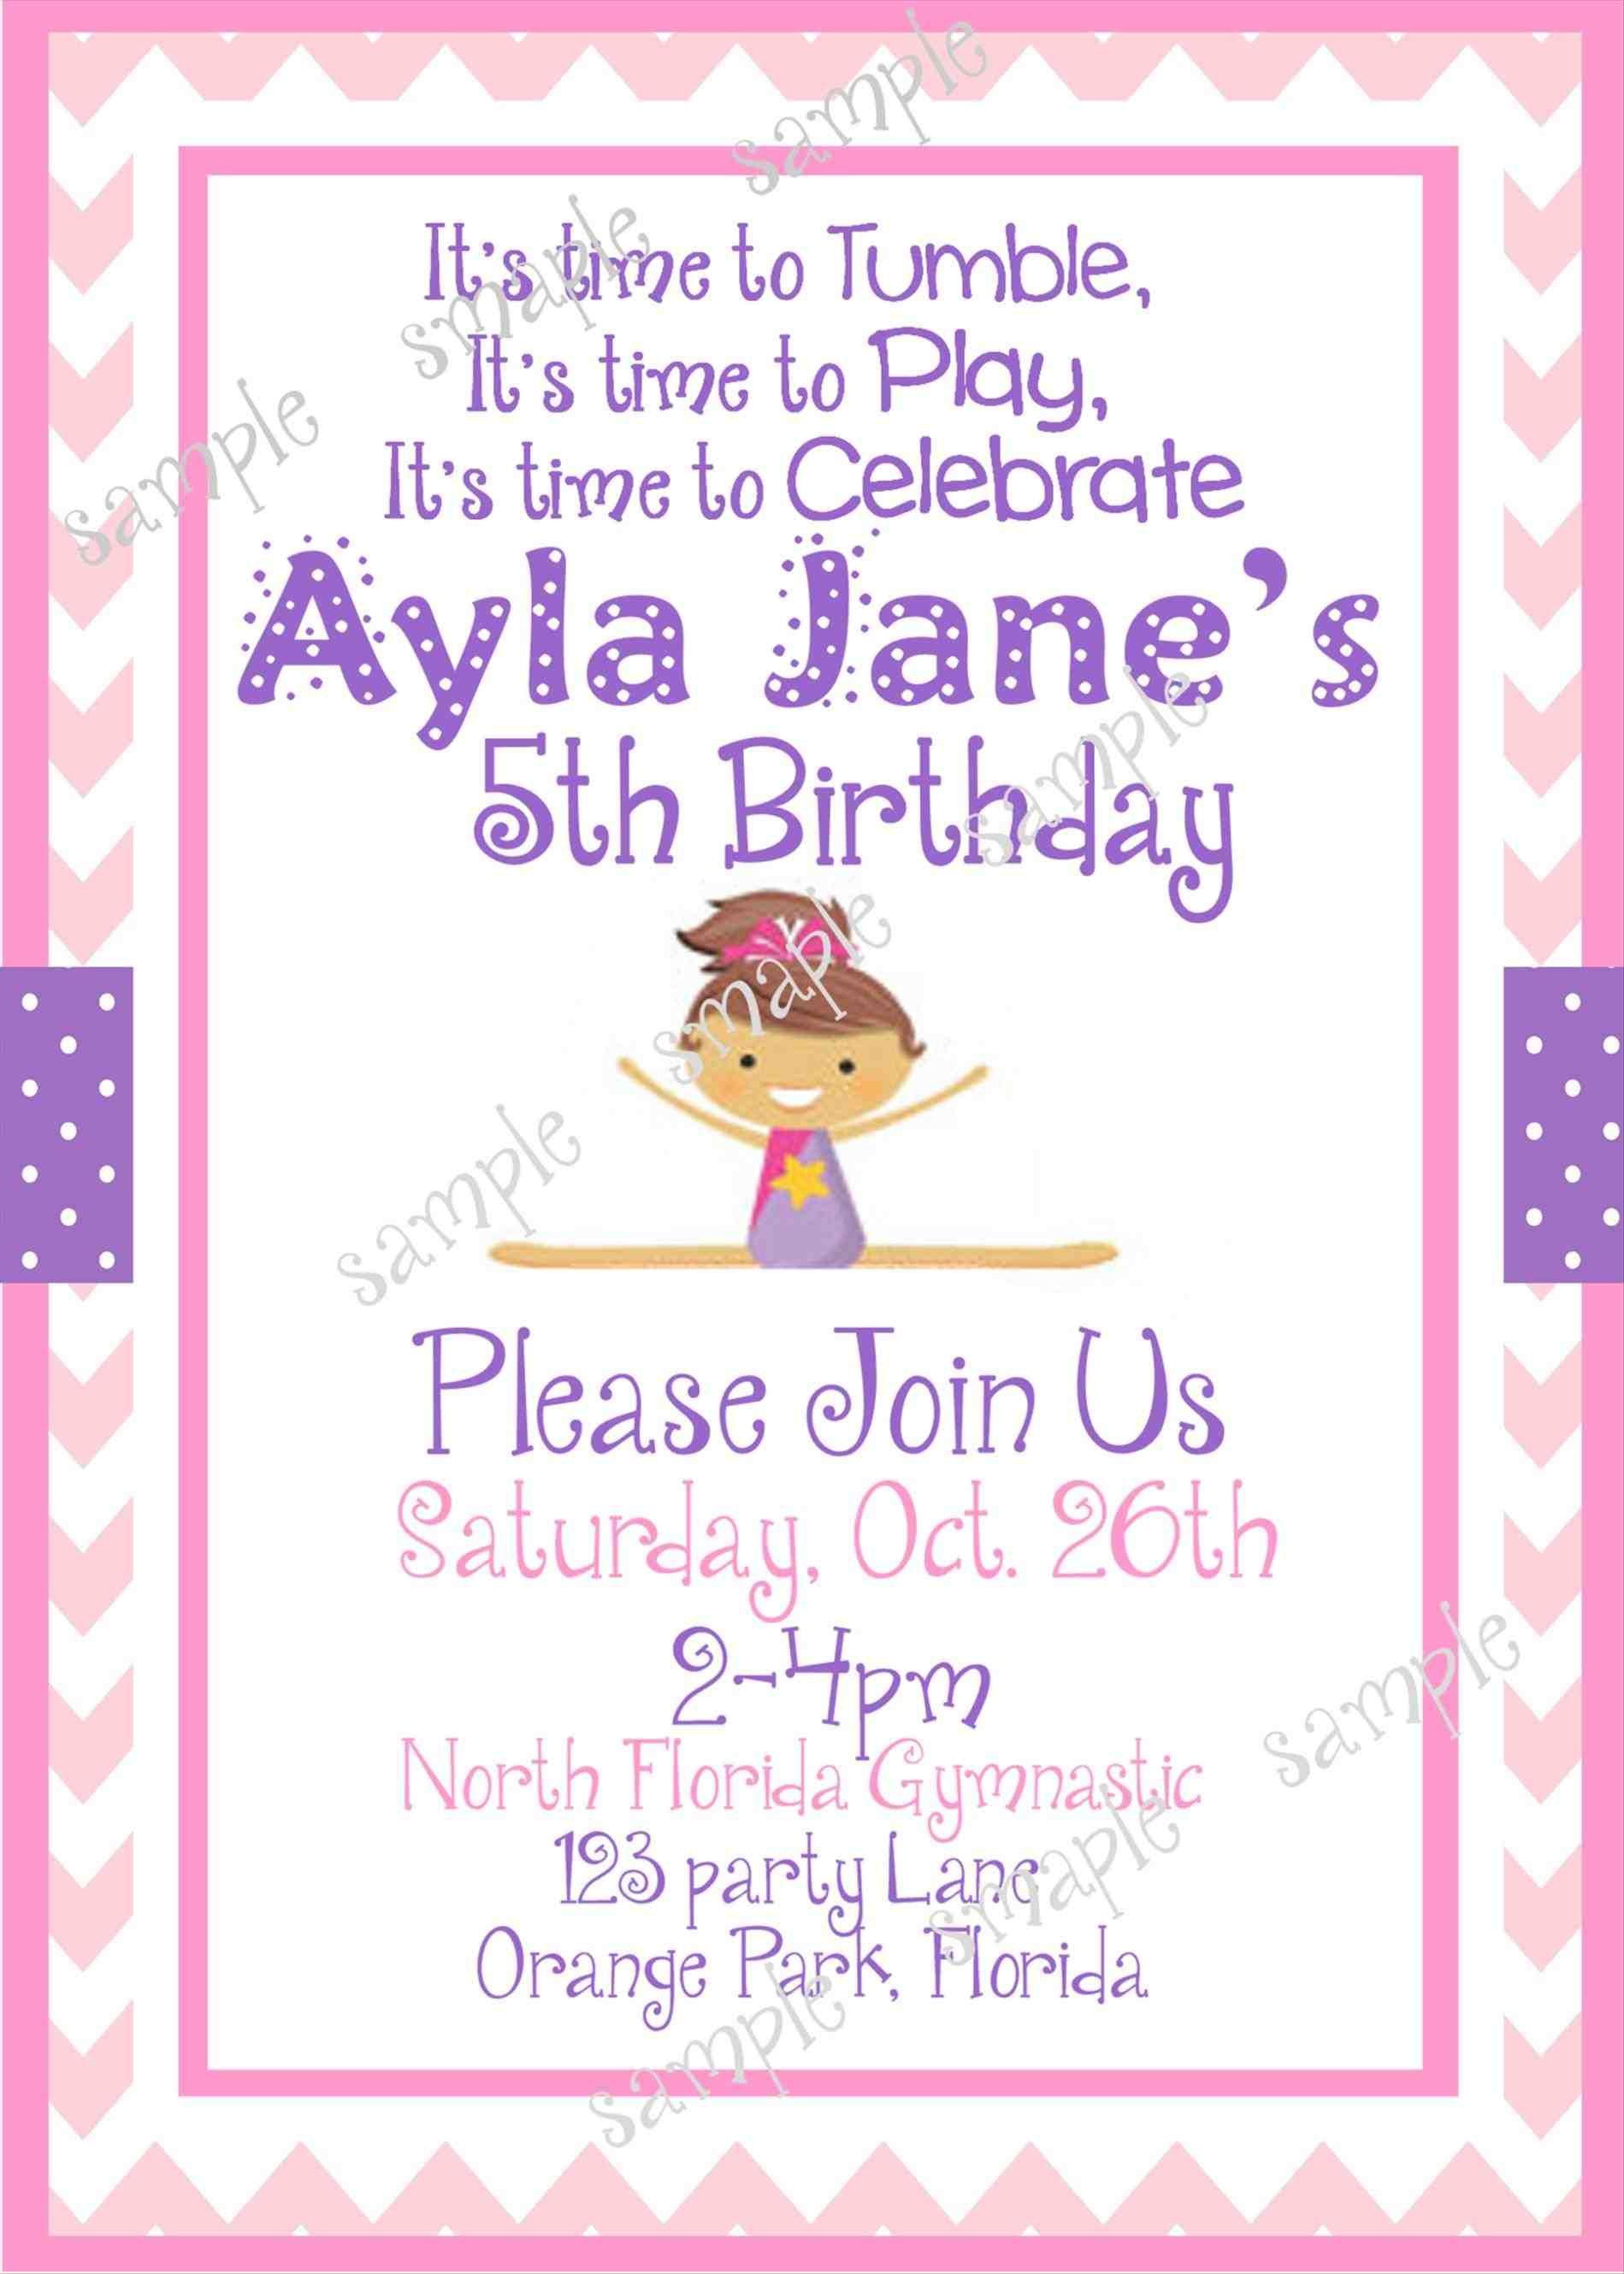 Bunny Birthday Invitation Using Silhouette Graces Popular - Bunny birthday invitation template